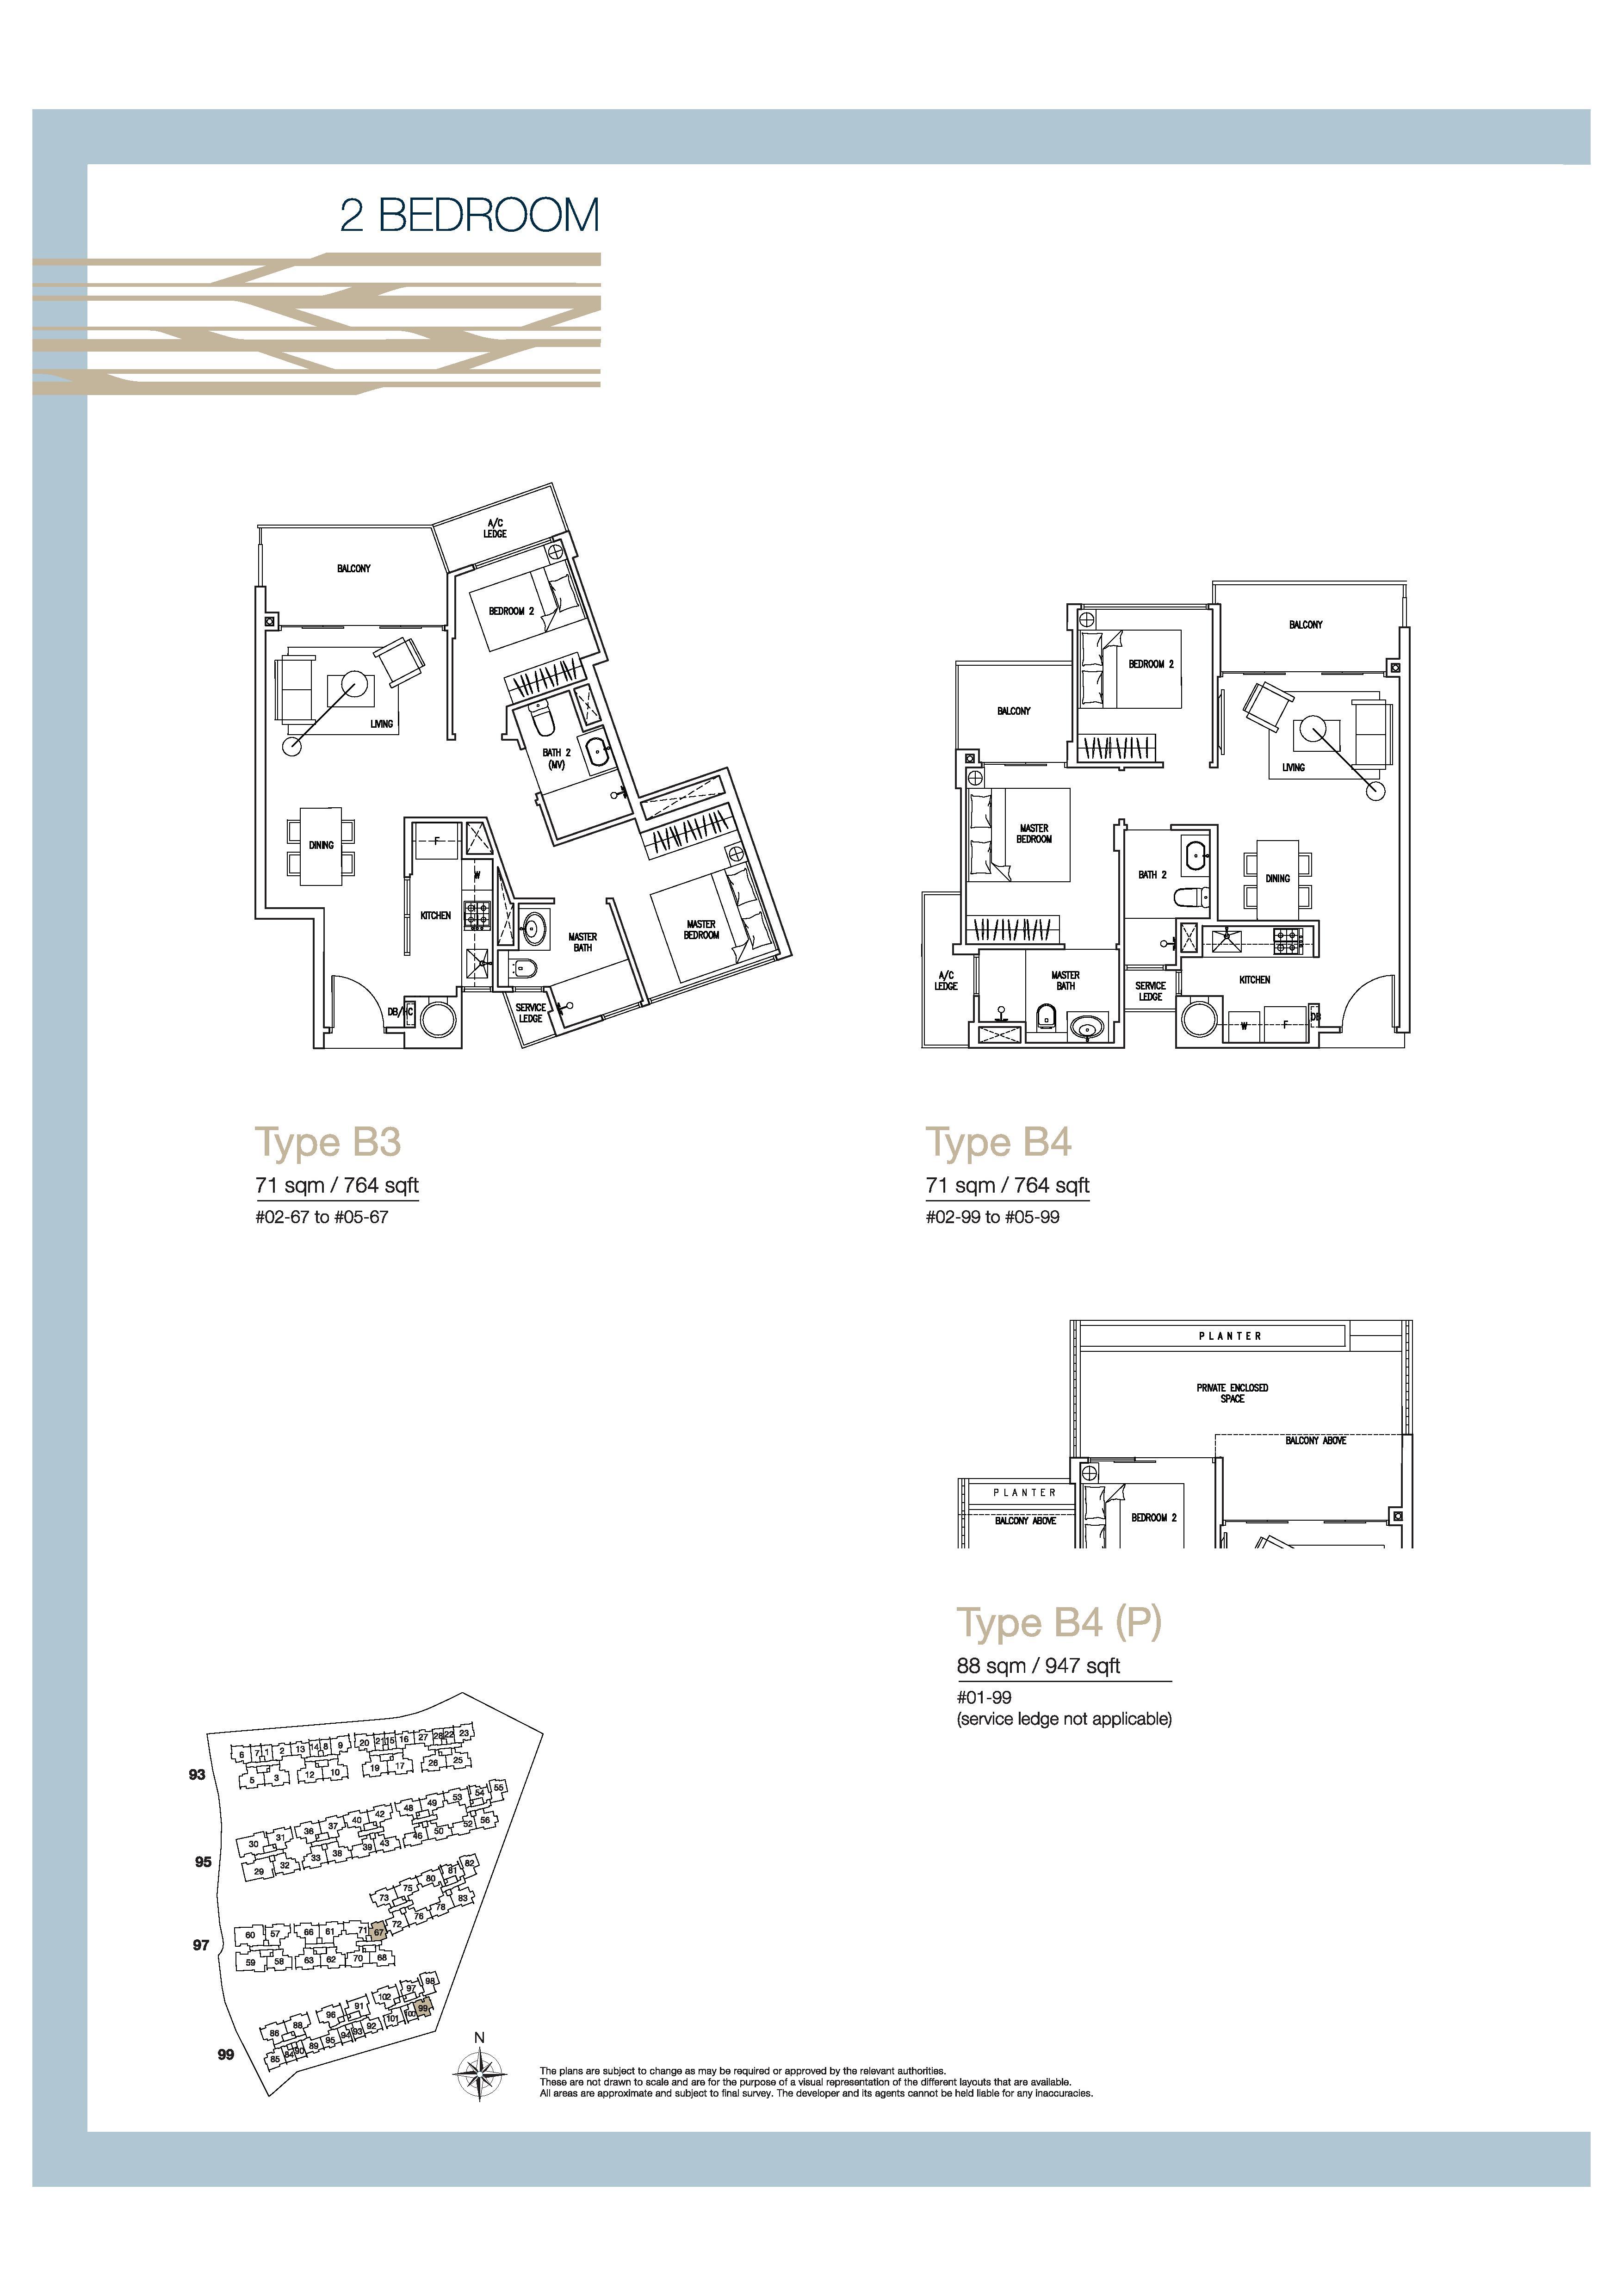 The Nautical 2 Bedroom Floor Plans Type B4, B4, B4(P)